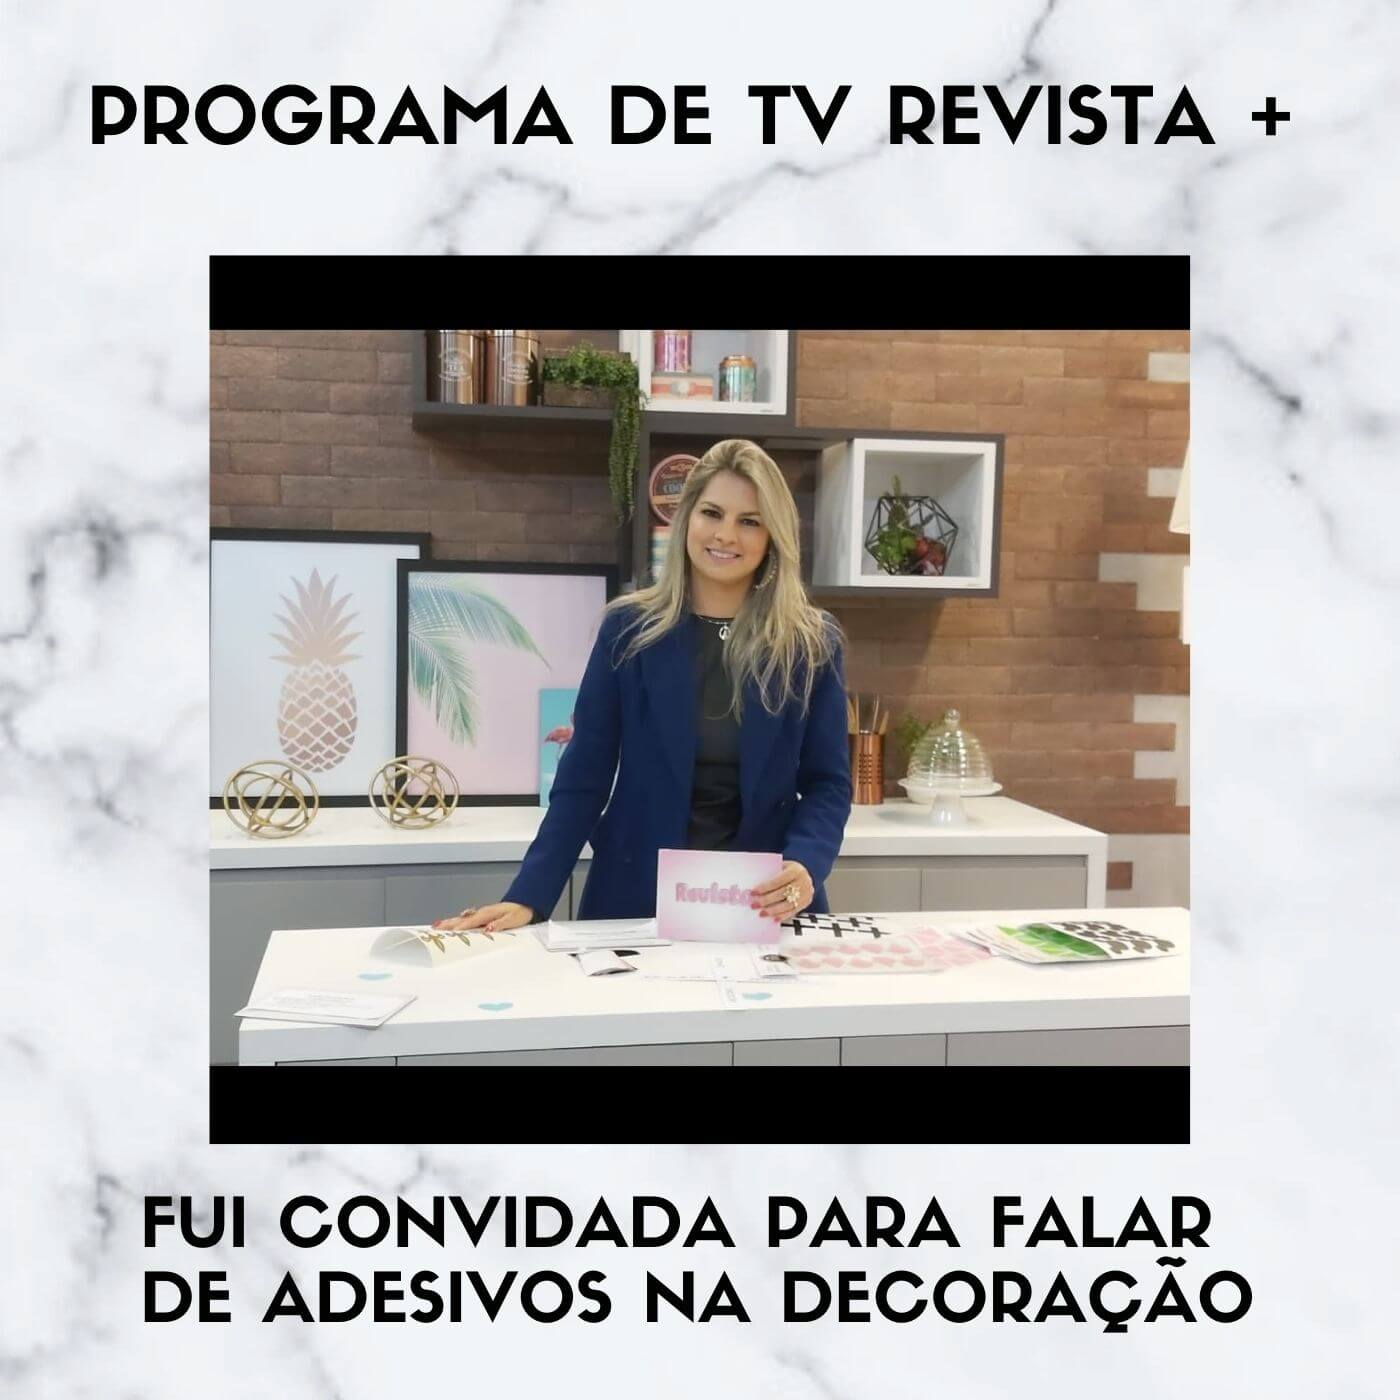 UNIÃO PALAVRA ADESIVA